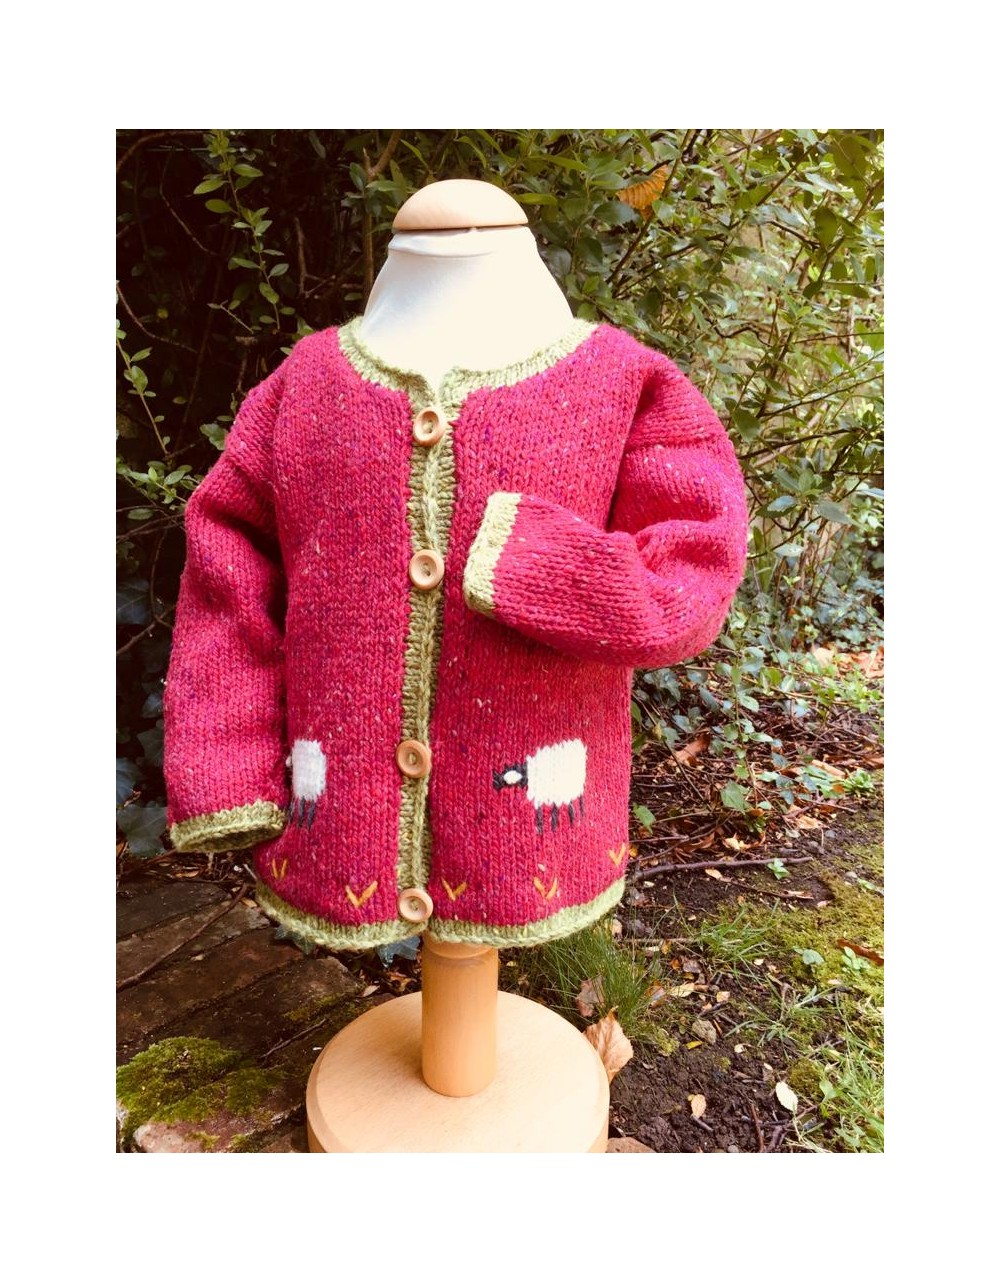 Childs Handmade Sheep Cardigan|Julie Dillon Knitwear|Irish Handcrafts 1